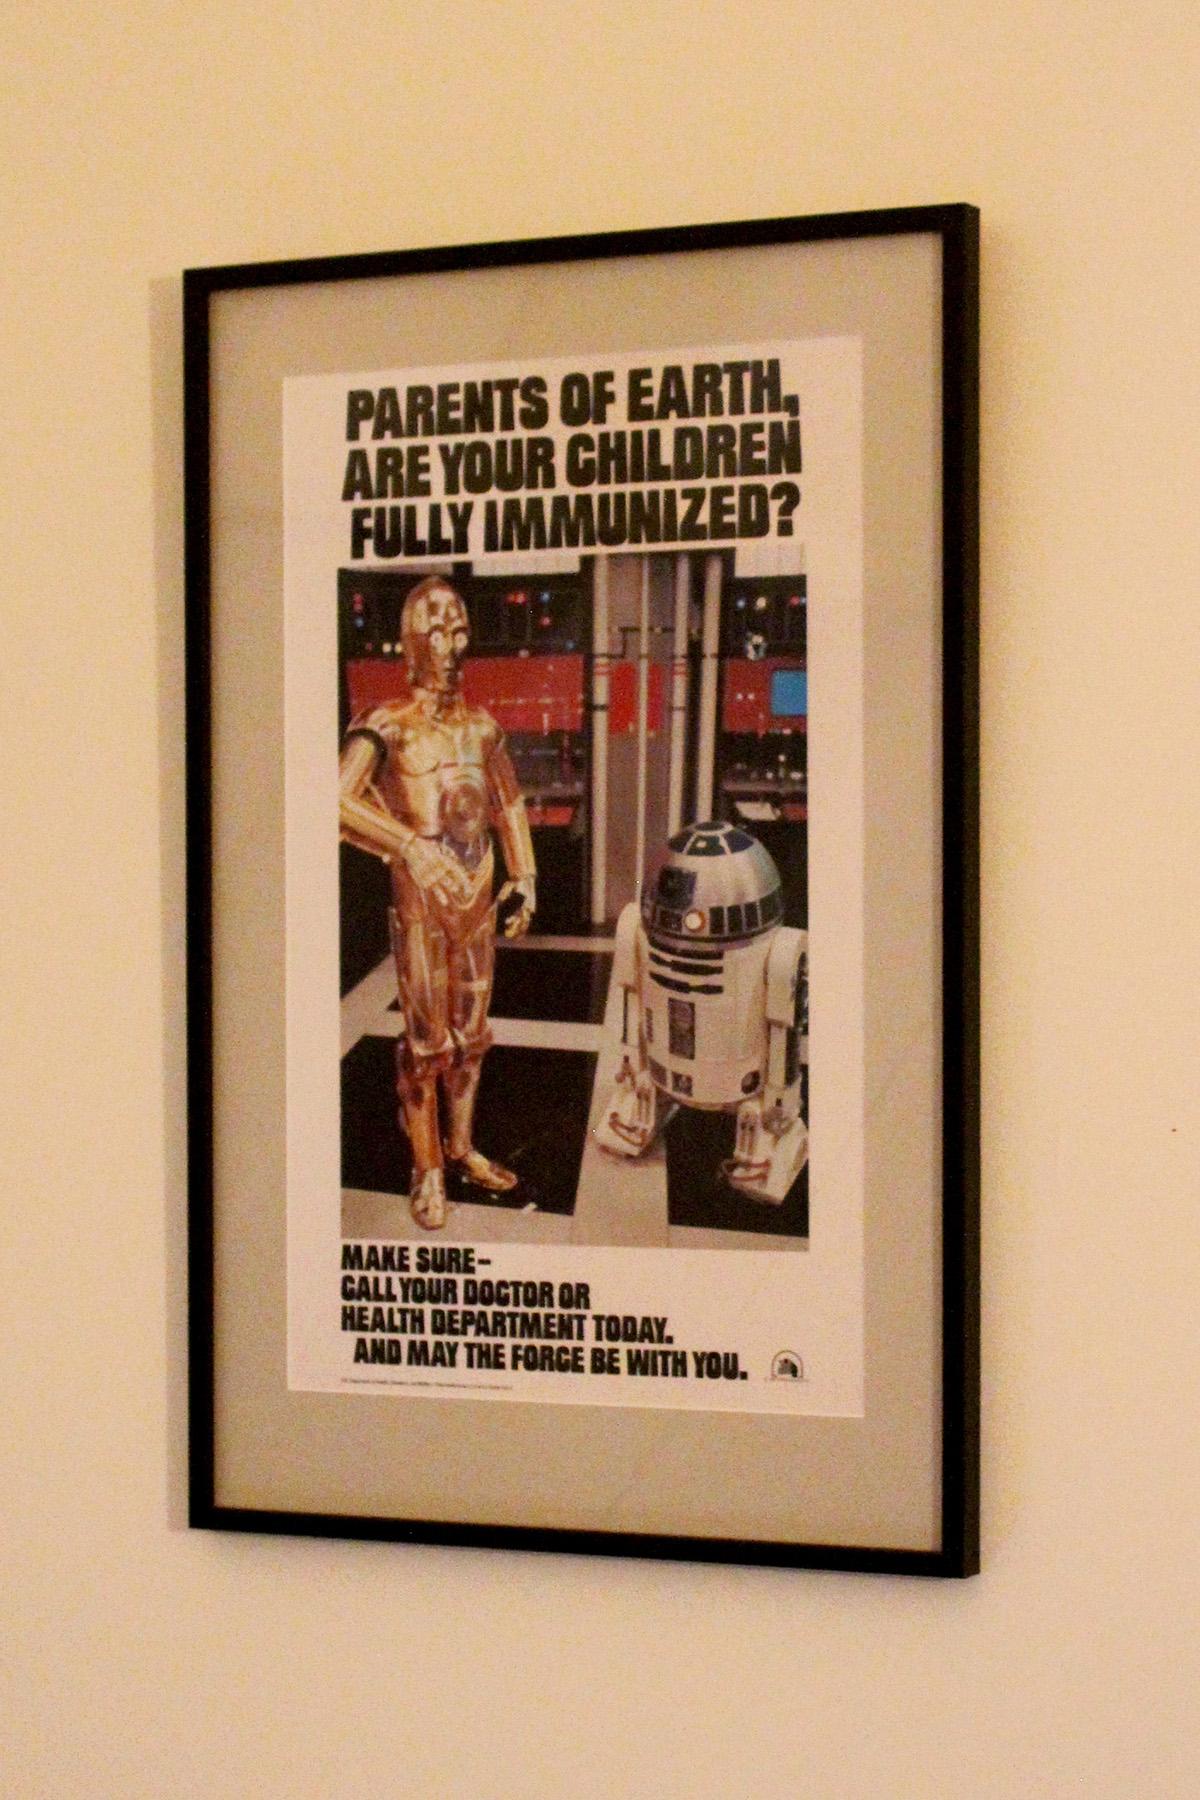 1970s public health poster